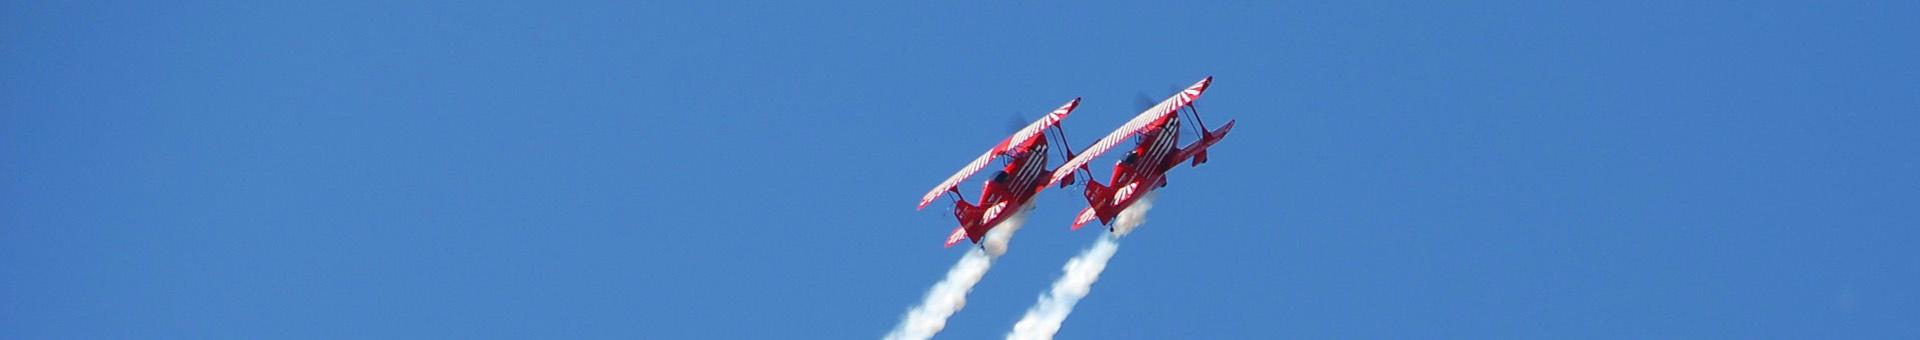 stunt-planes1.jpg